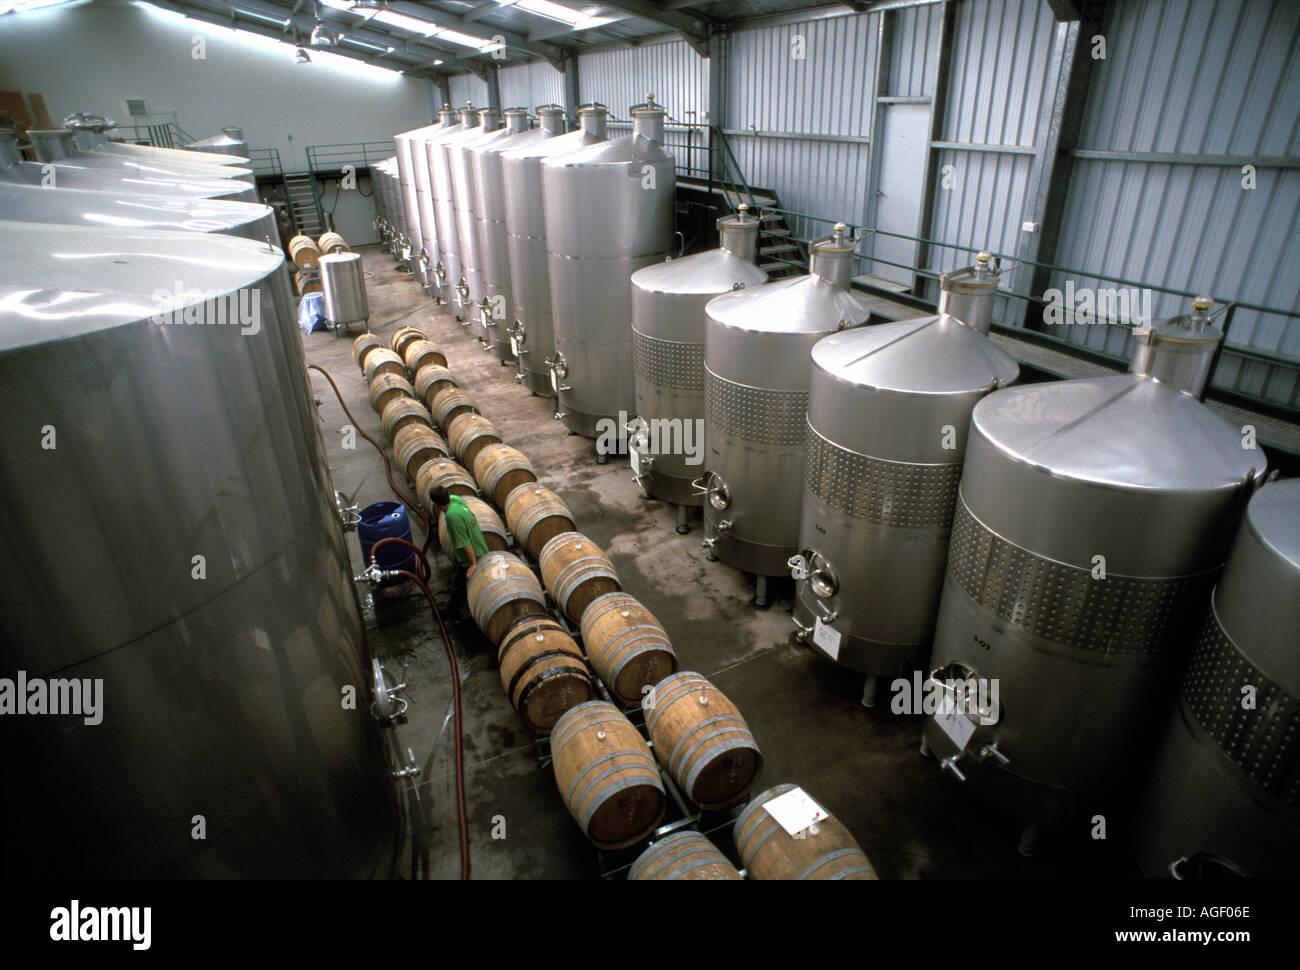 New Zealand Renwick Wine Storage Tanks At Framingham Winery Marlborough  Region